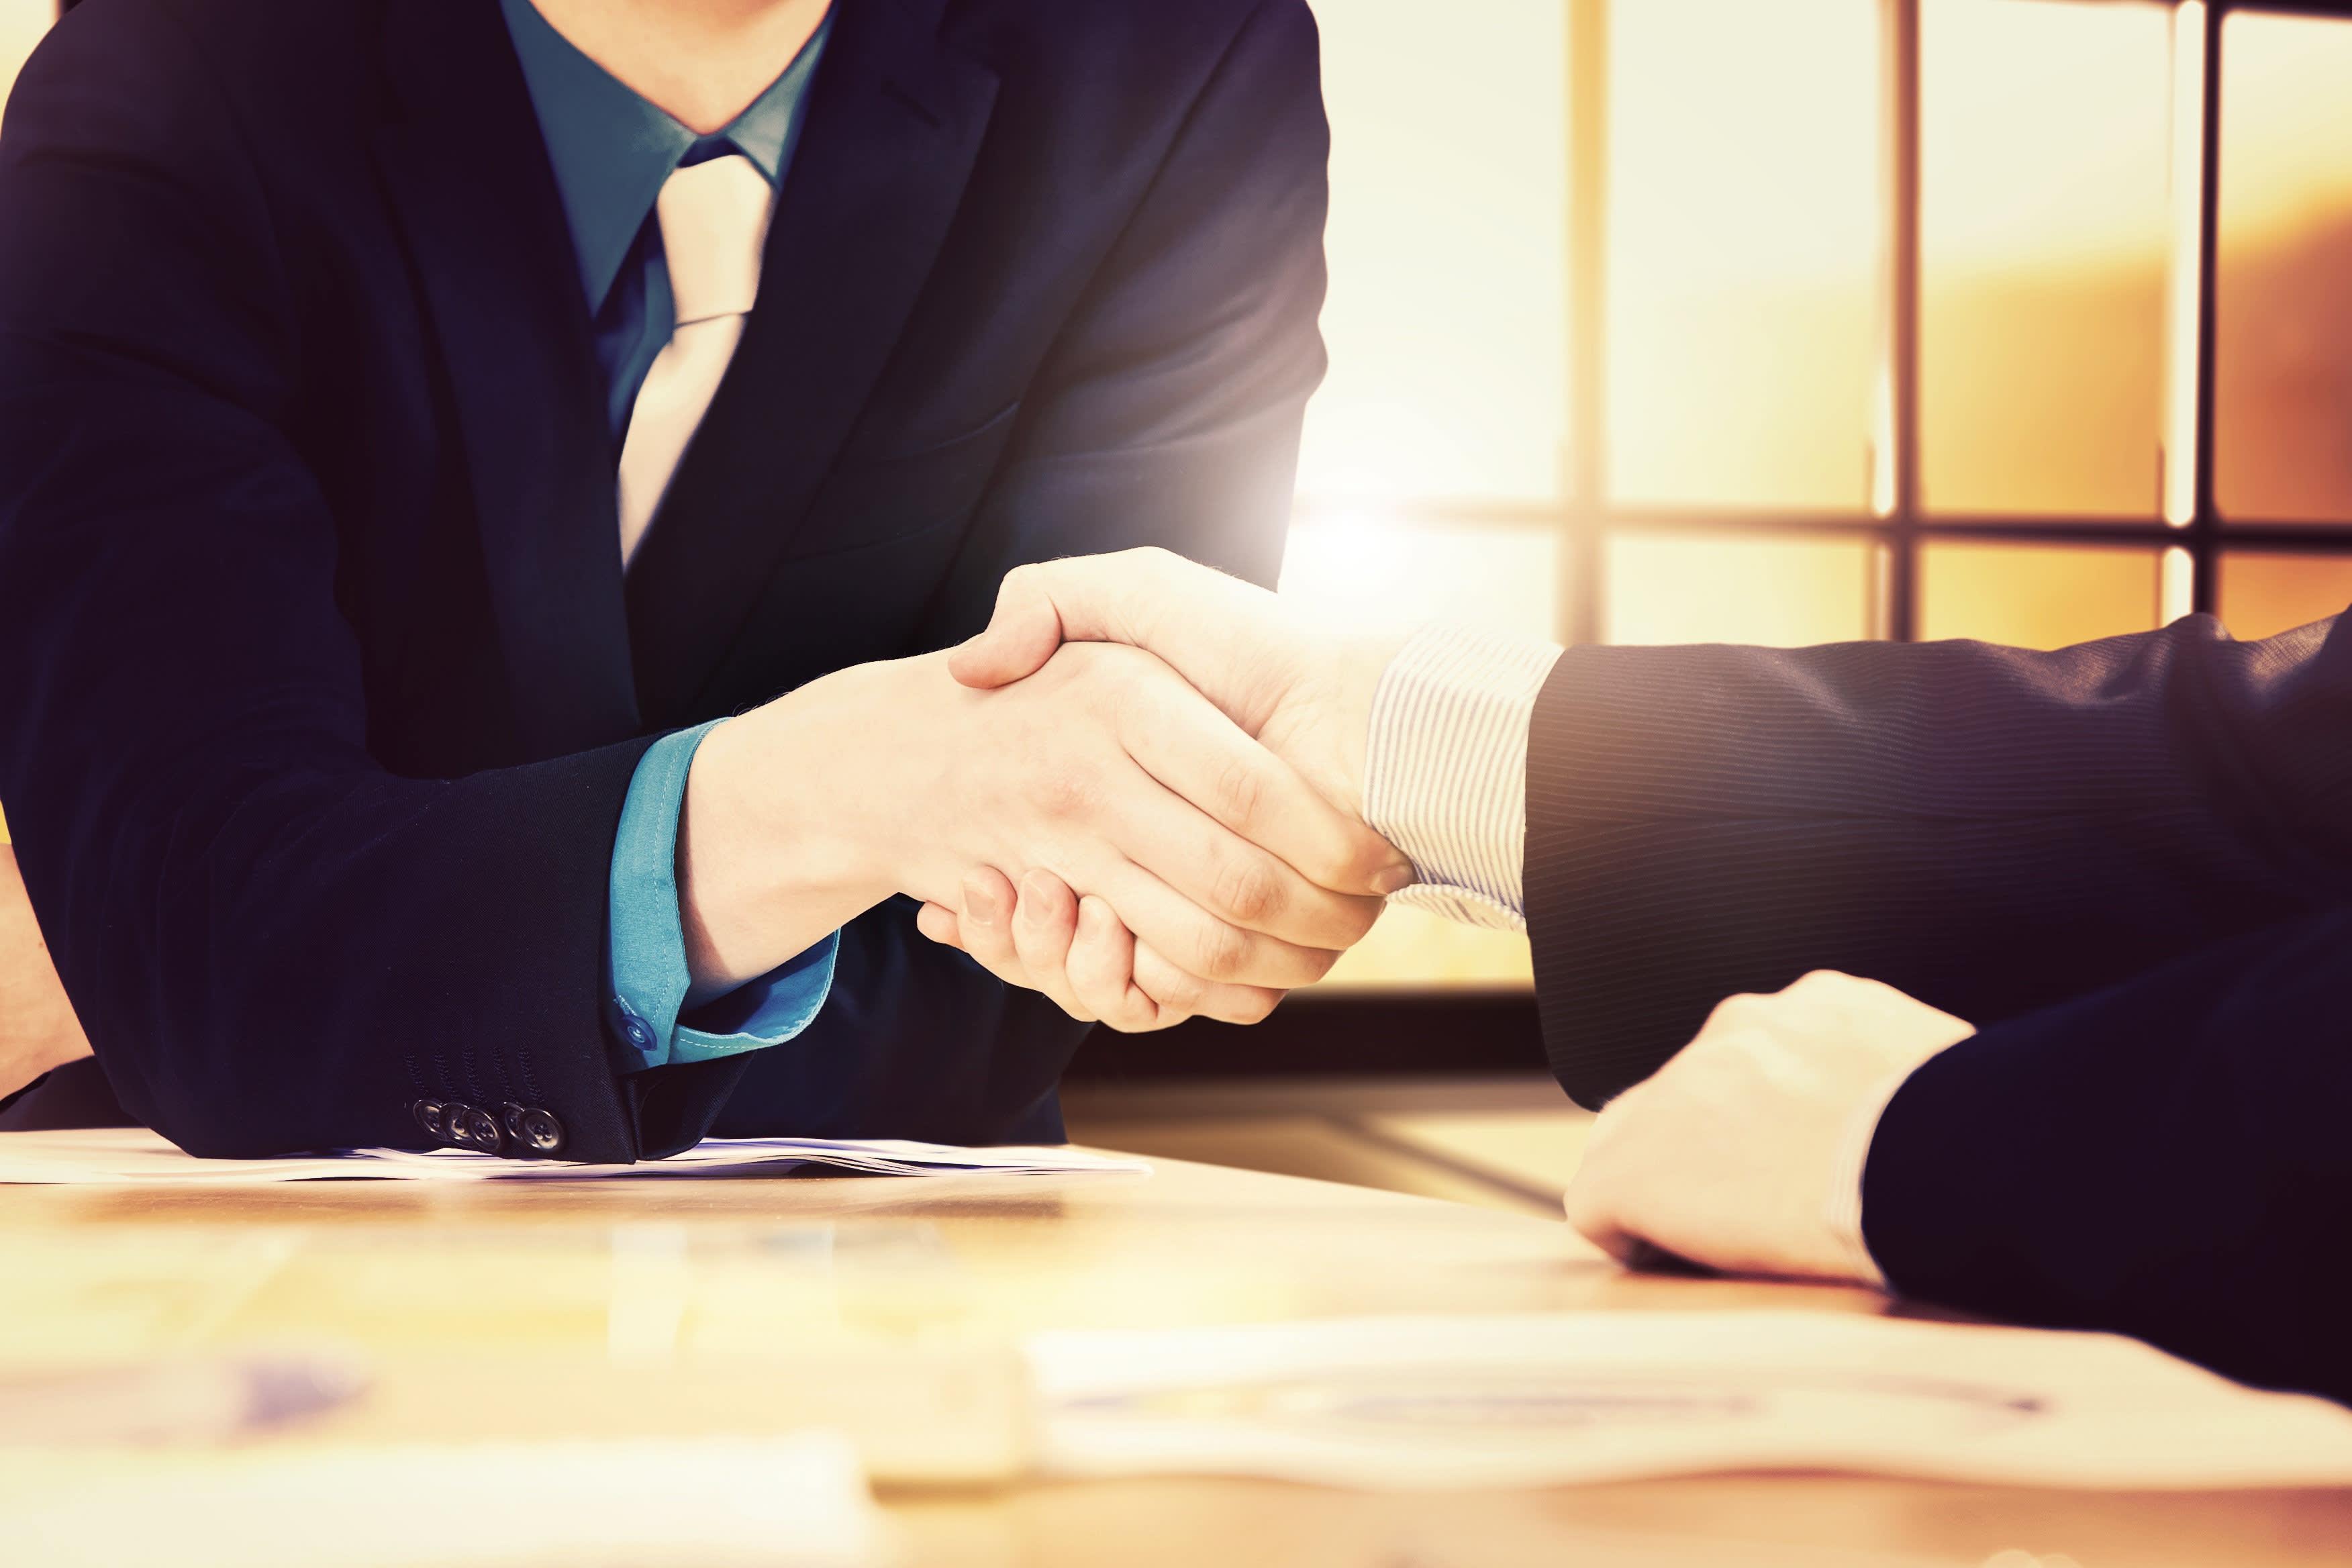 First master trust receives authorisation